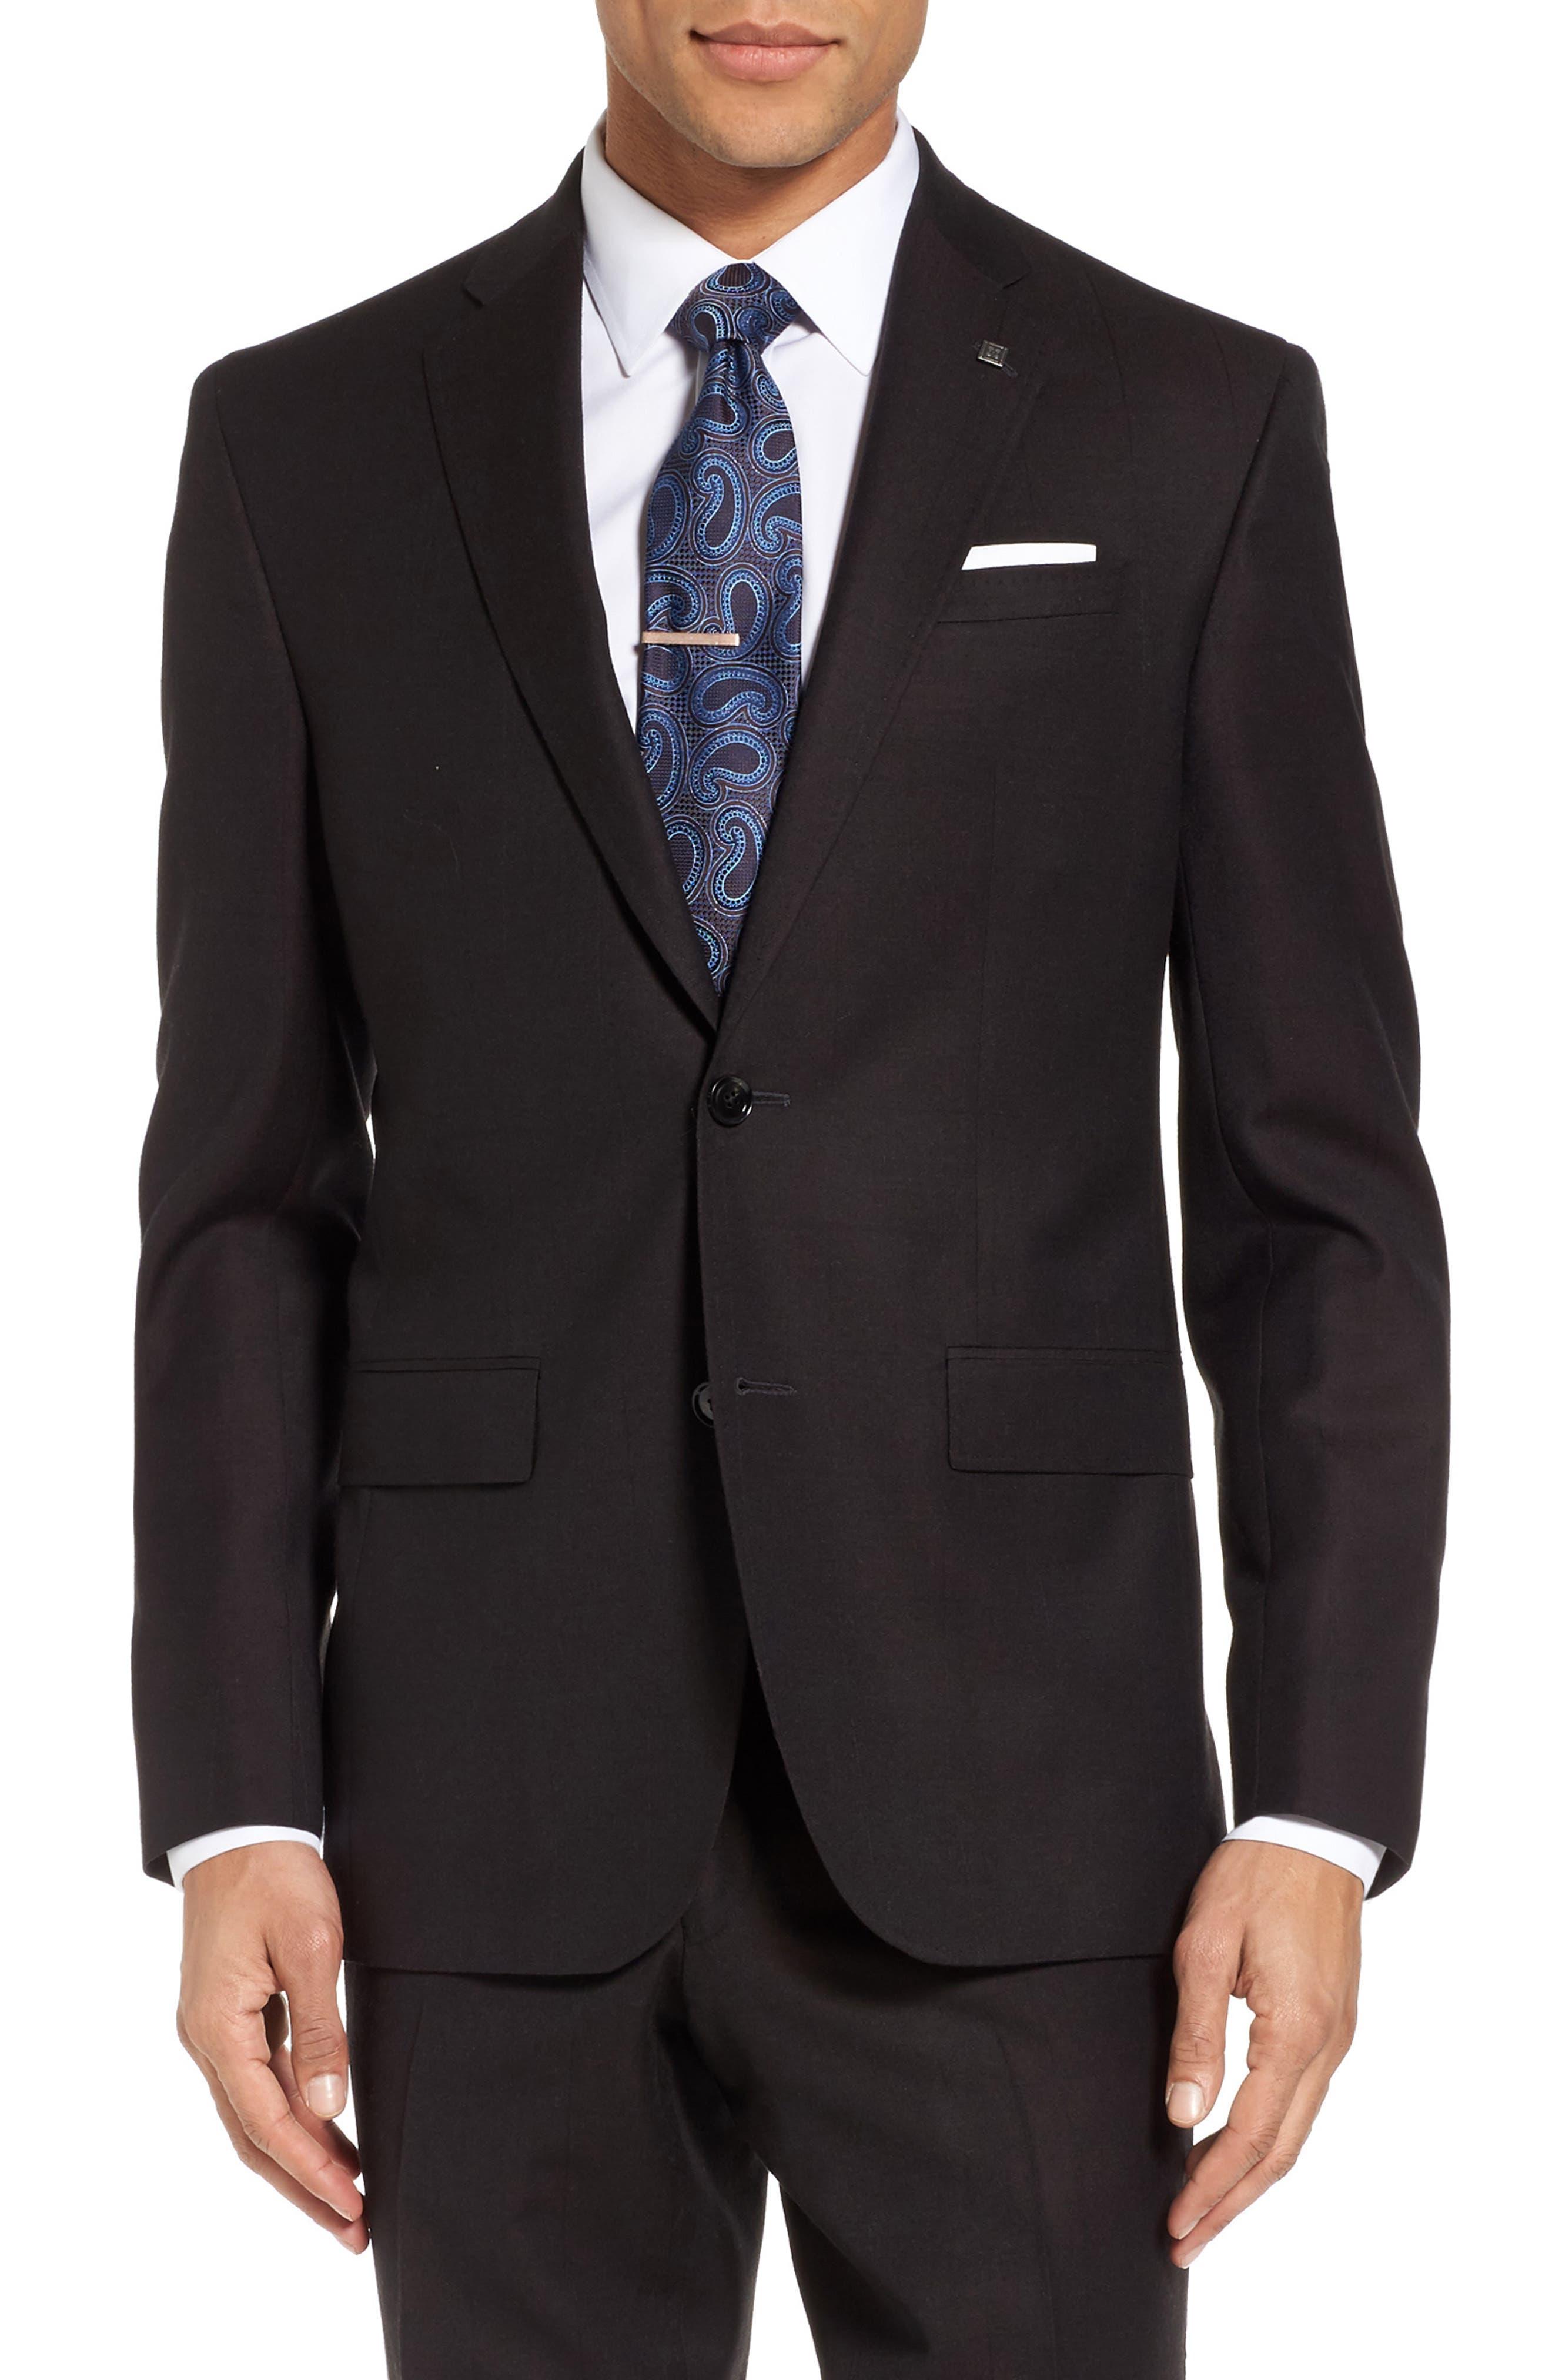 Jay Trim Fit Solid Wool Suit,                             Alternate thumbnail 5, color,                             200